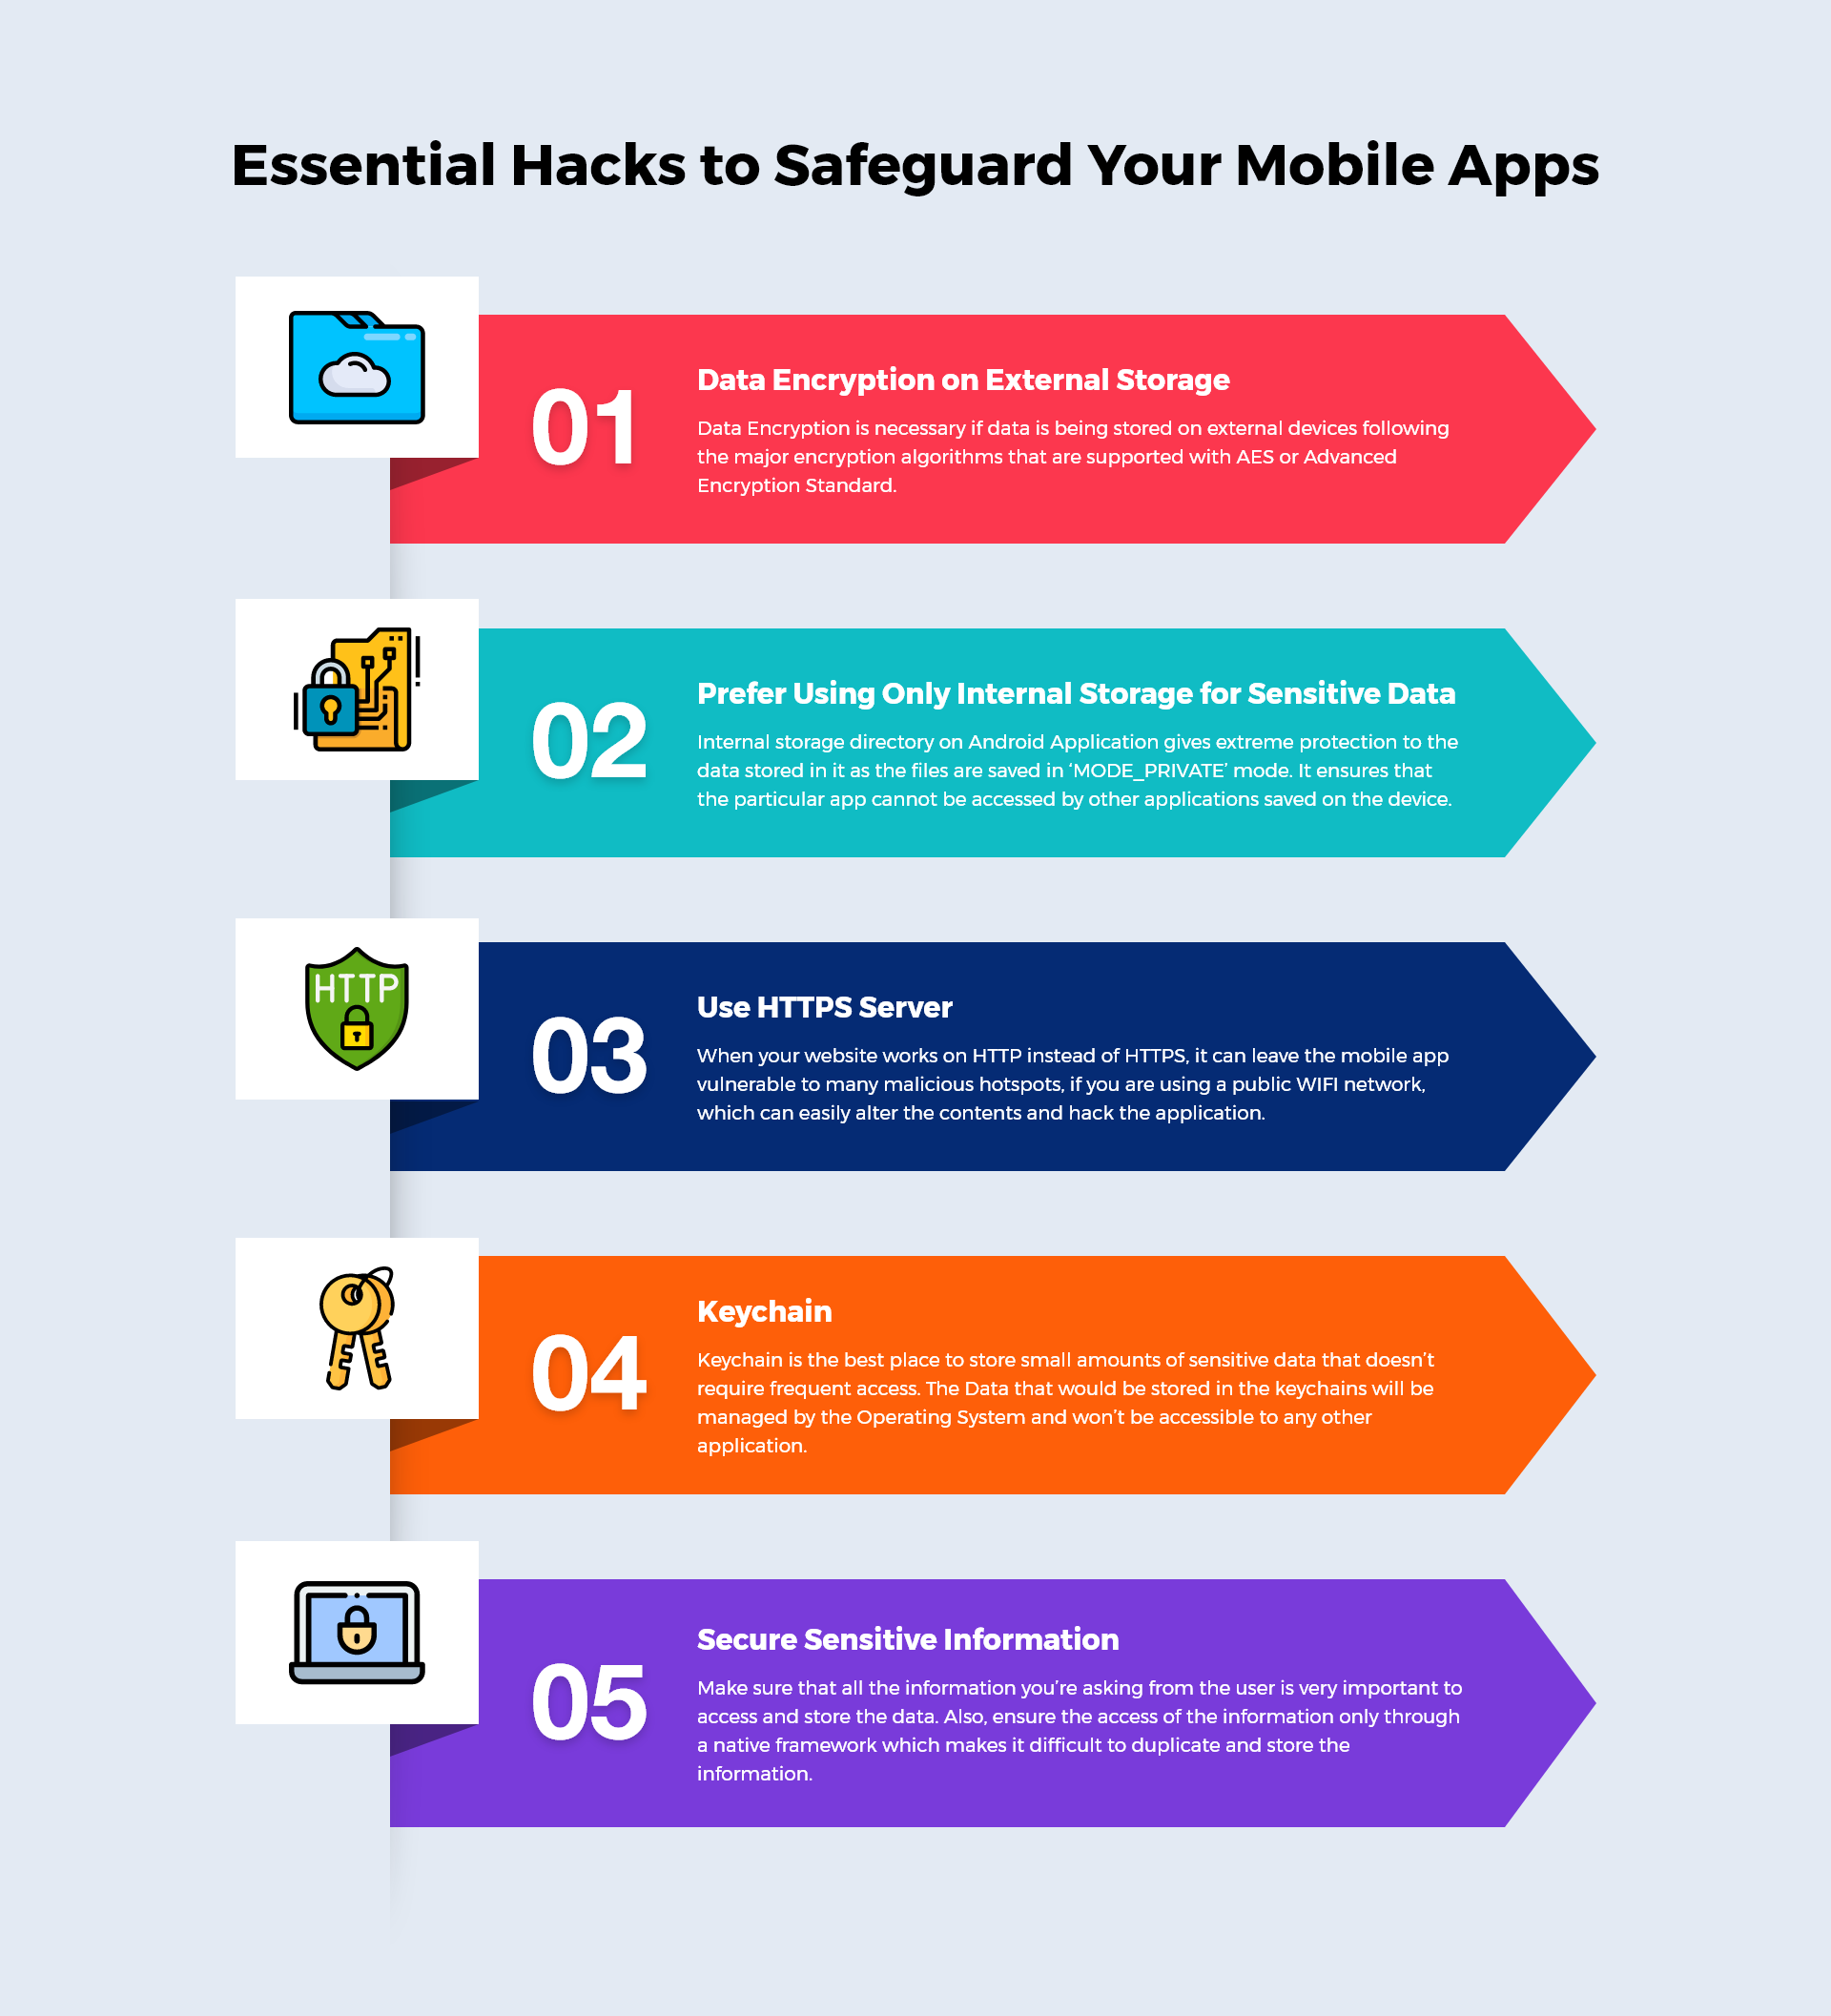 hacks to safeguard mobile